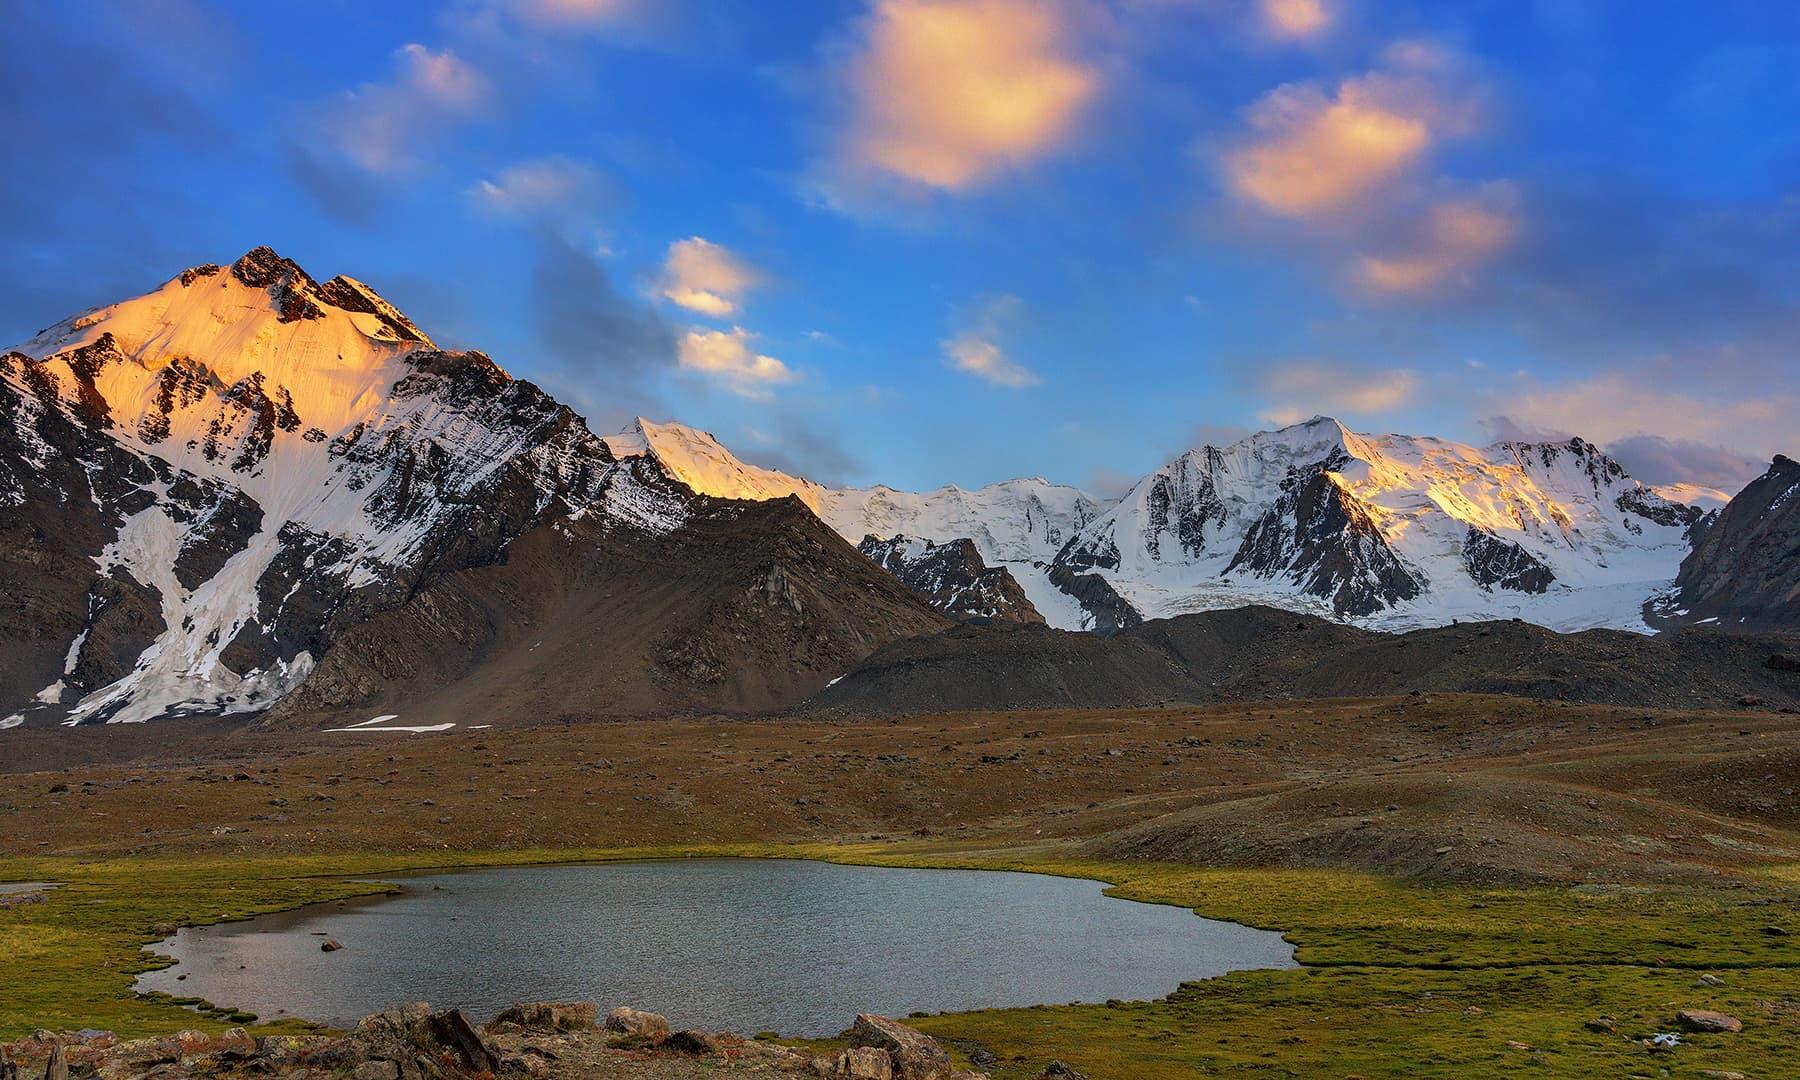 جھیل اور ڈھلٹا سورج—سید مہدی بخاری